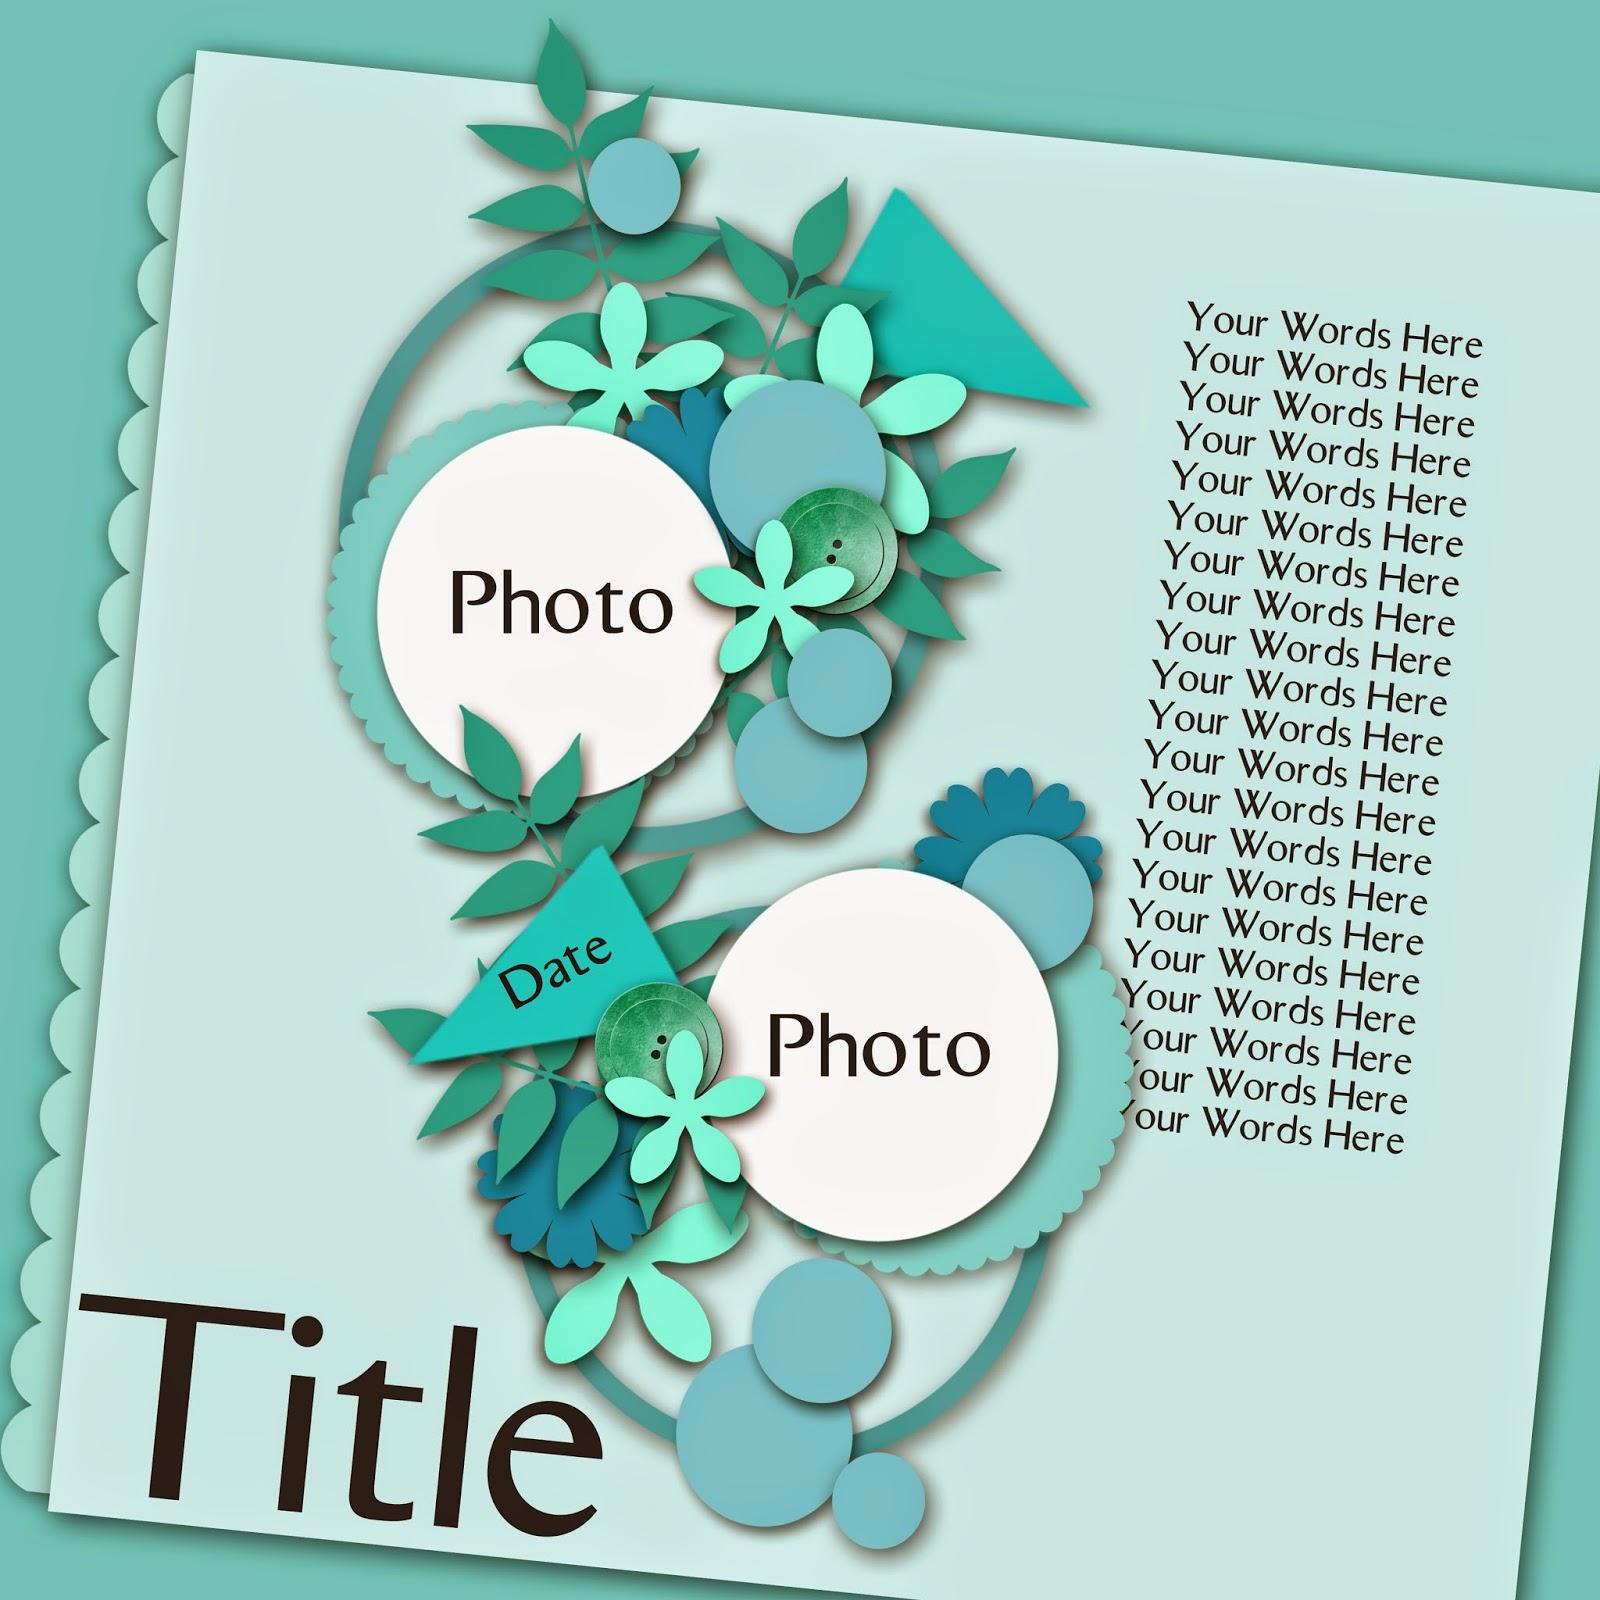 http://2.bp.blogspot.com/-f7Iqe8WdOuM/Uz4O4i3dhMI/AAAAAAAAAZI/h66MU0yXqf4/s1600/04_03_14.jpg